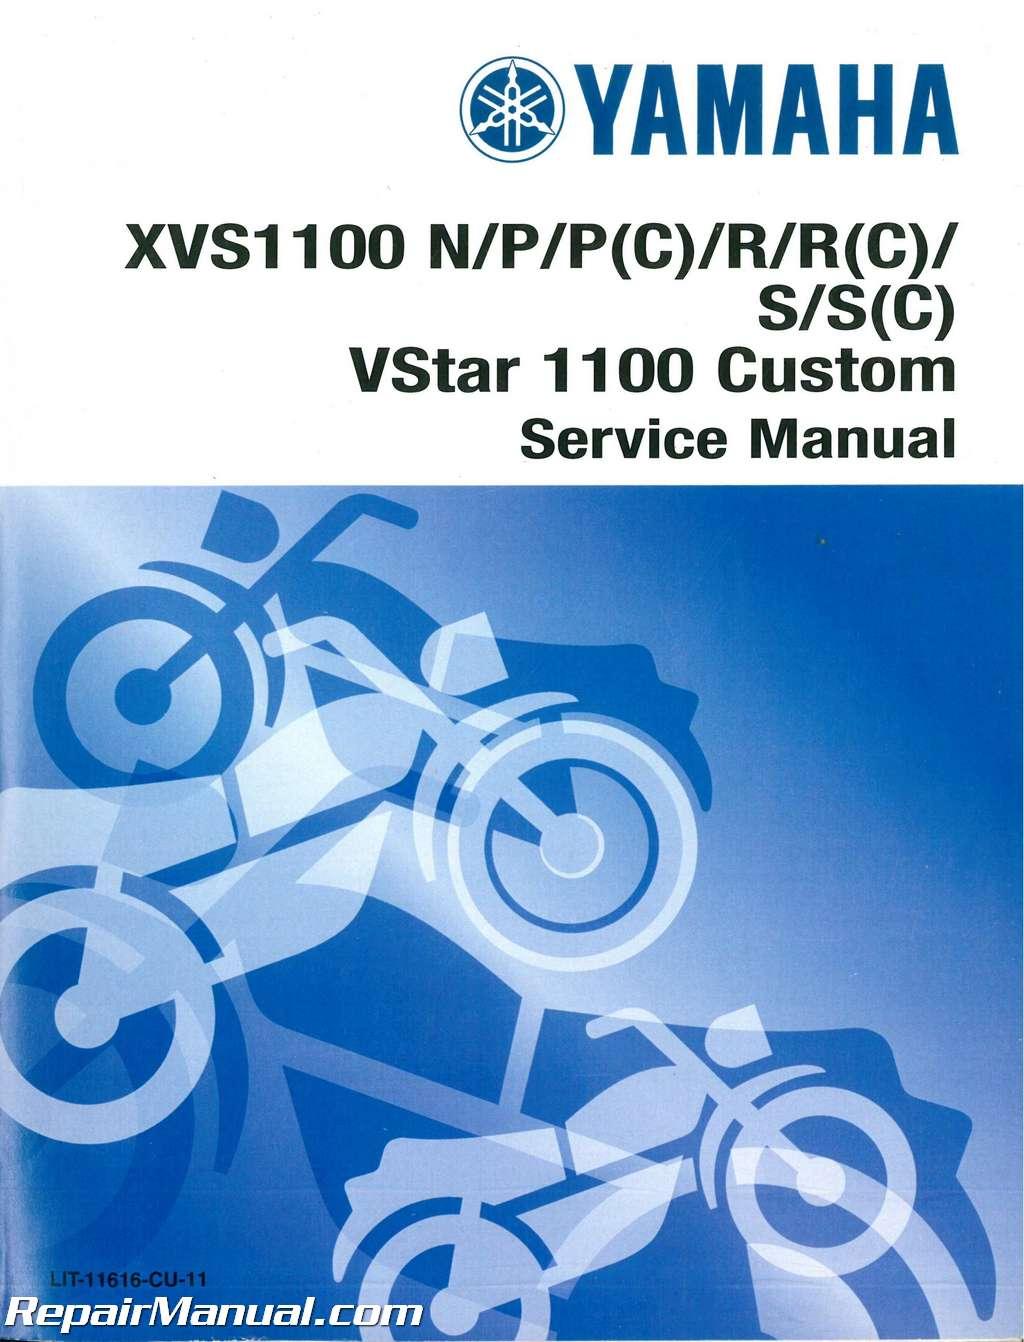 2003 yamaha vstar 1100 custom factory service manual